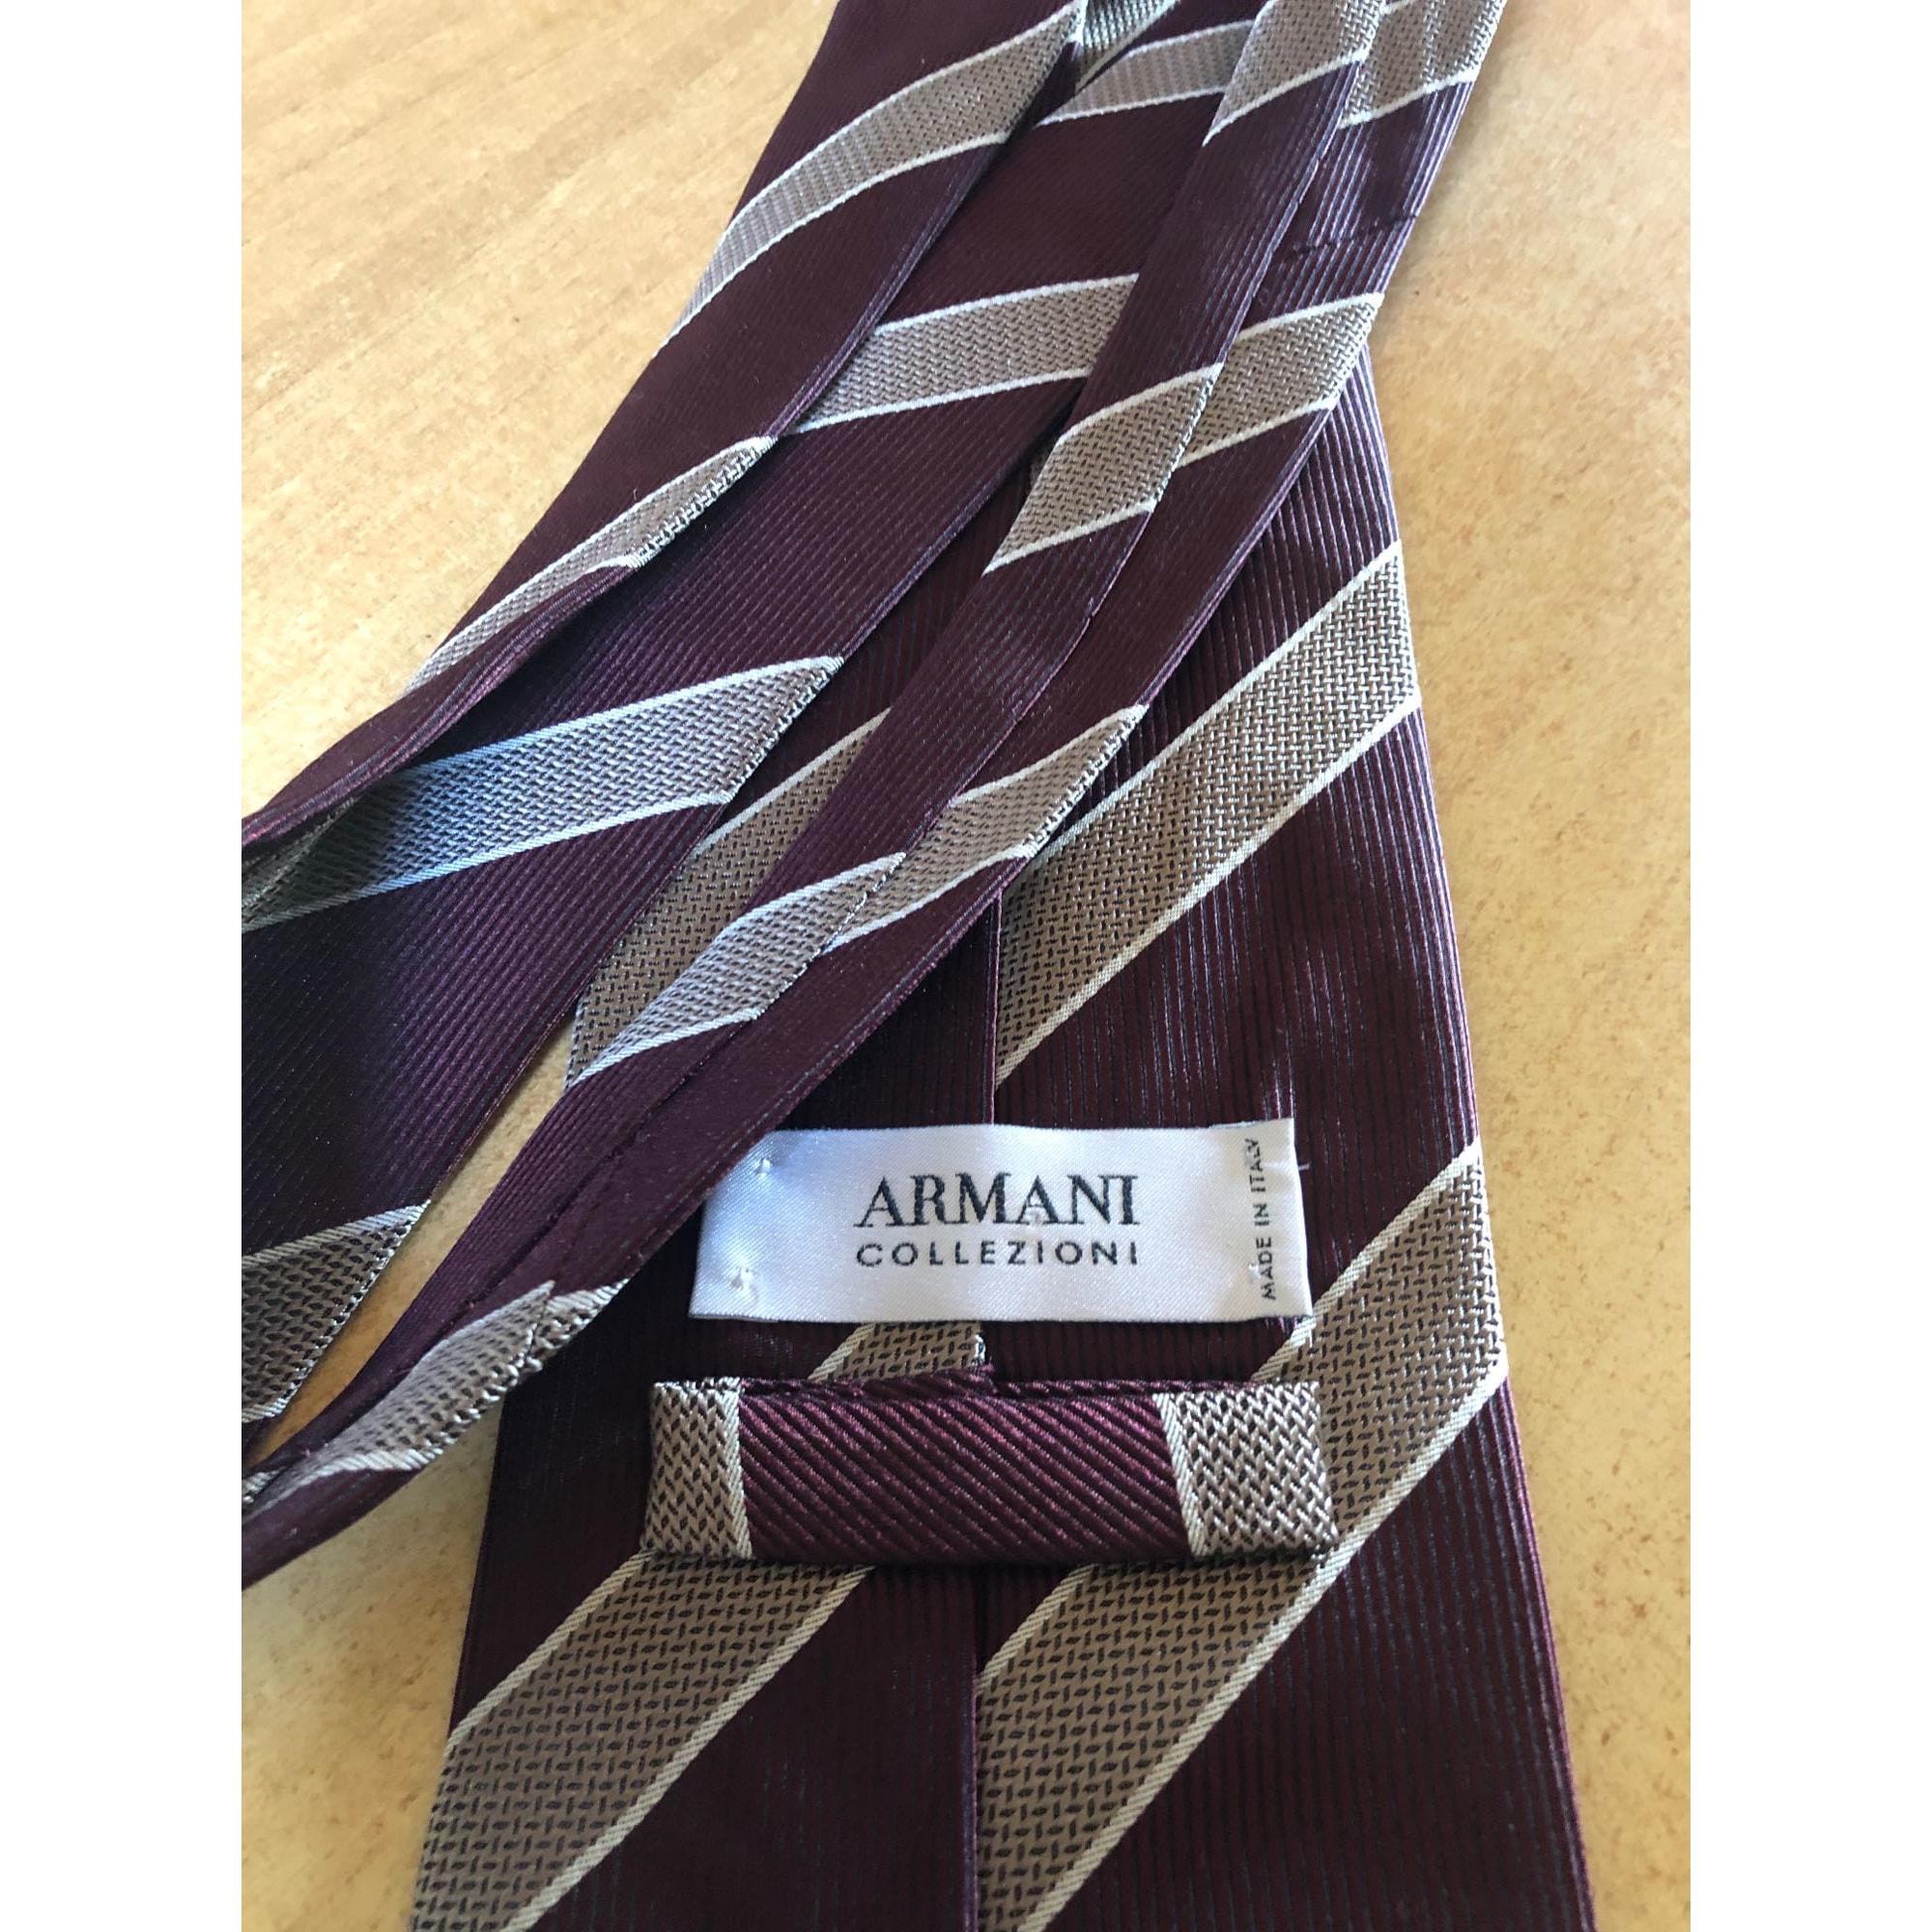 Cravate ARMANI Multicouleur